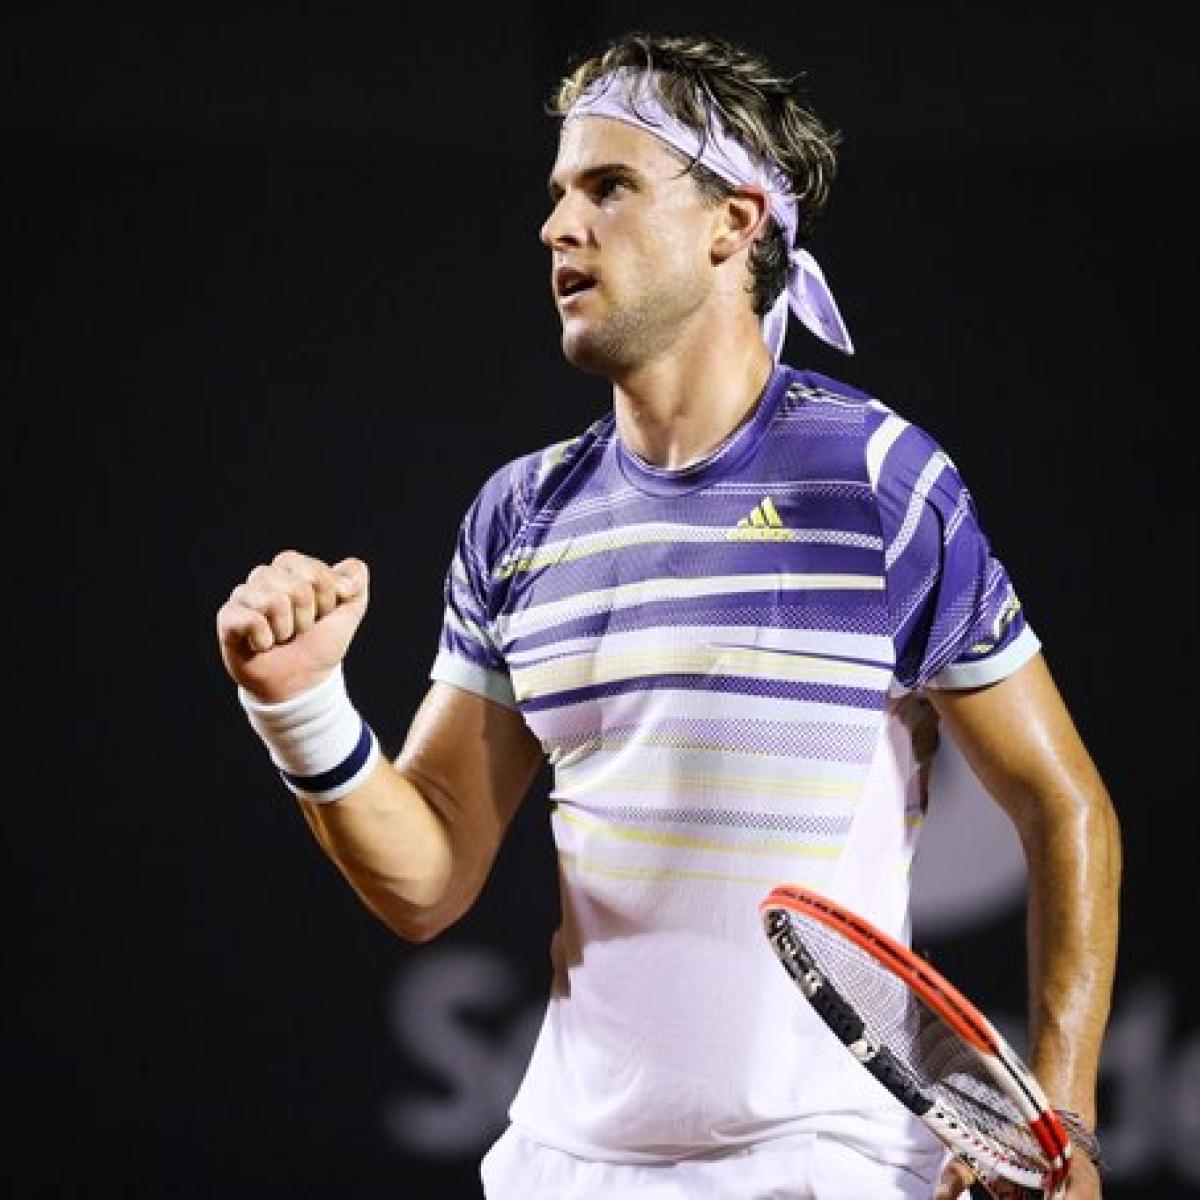 Rio Open: Dominic Thiem defeats Felipe Meligeni in three-set thriller, advances to pre-quarterfinals